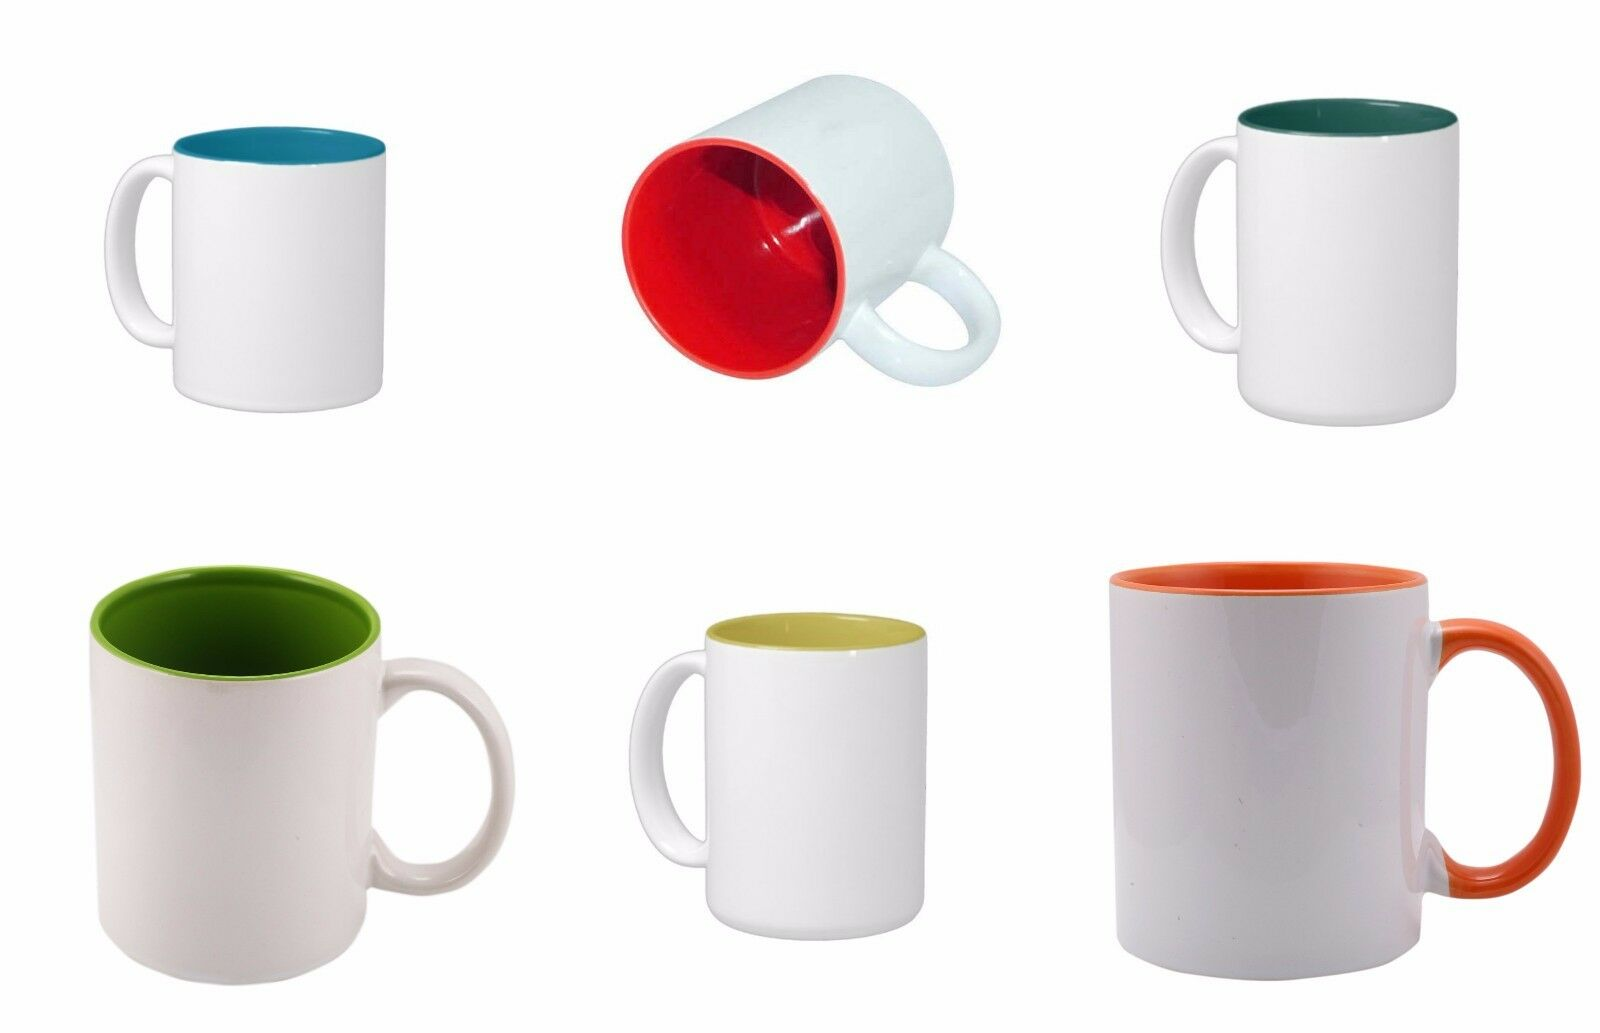 Sublimation Colourot 48 Mugs Double Layer Coated 11oz Tea Coffee Home Mug AAA